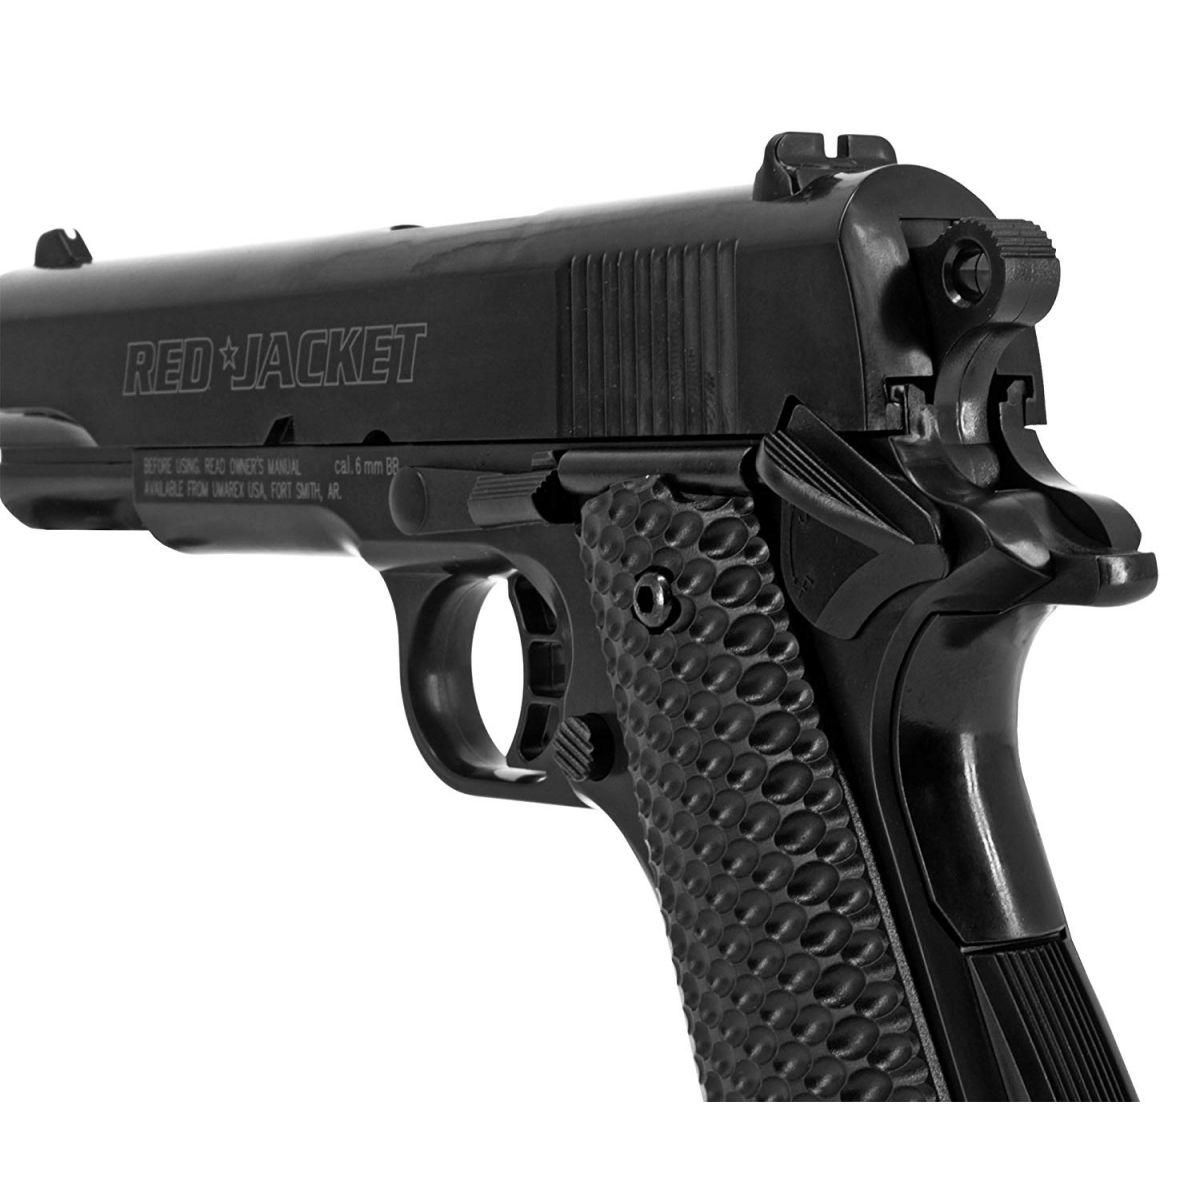 Umarex Red Jacket M1911 6mm Airsoft Spring Pistol rear